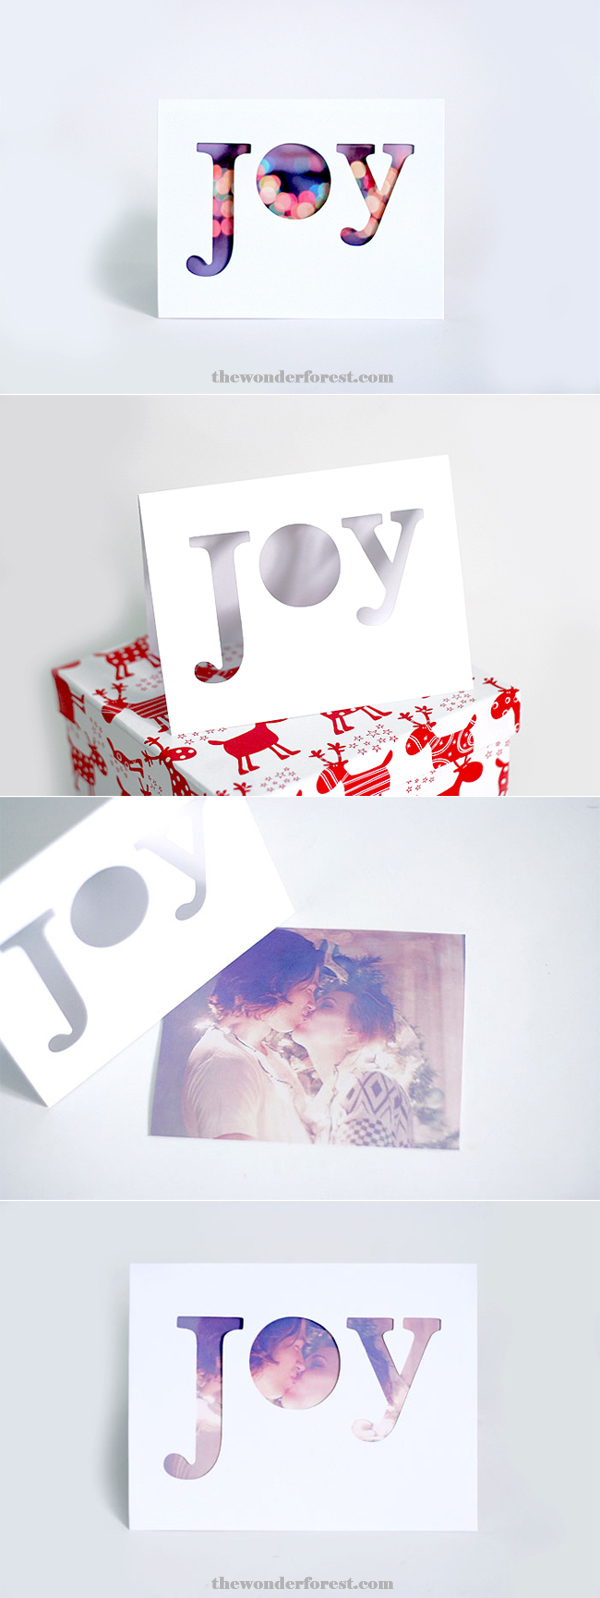 Diy Christmas Cards 30 Diy Christmas Cards How To Make Homemade Holiday Cards